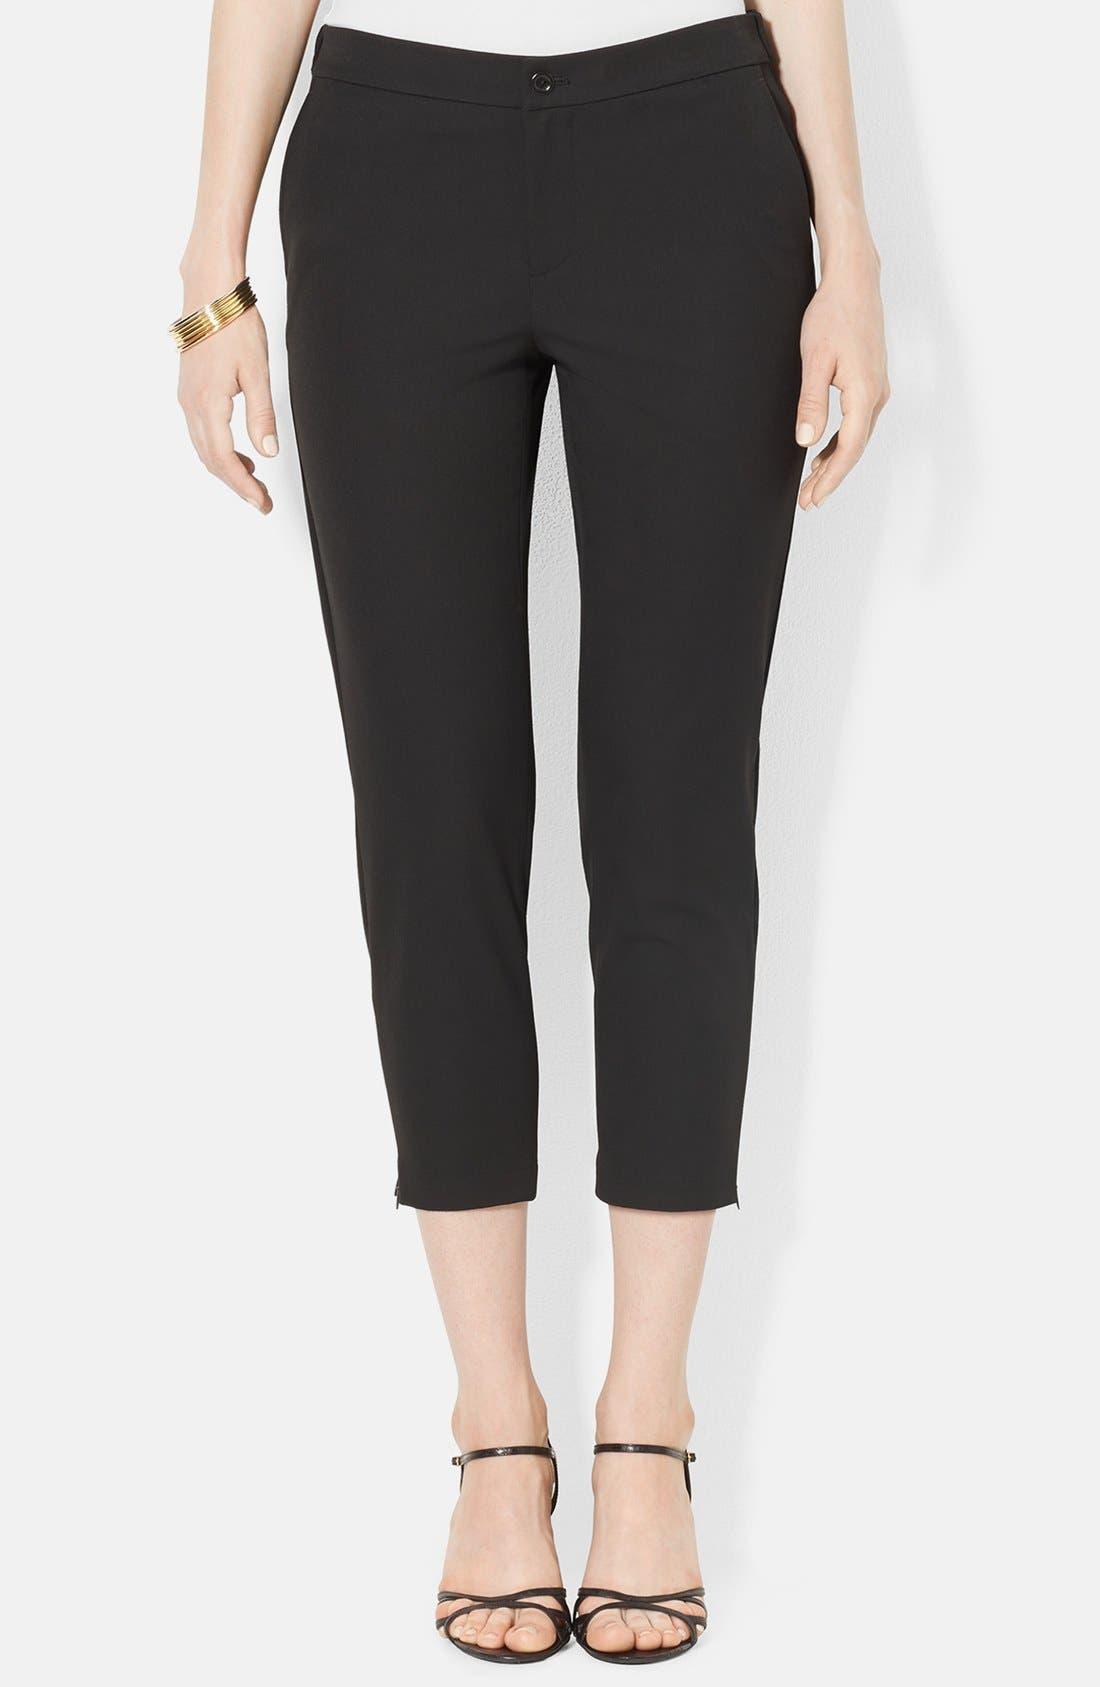 Alternate Image 1 Selected - Lauren Ralph Lauren Stretch Crop Skinny Pants (Petite)